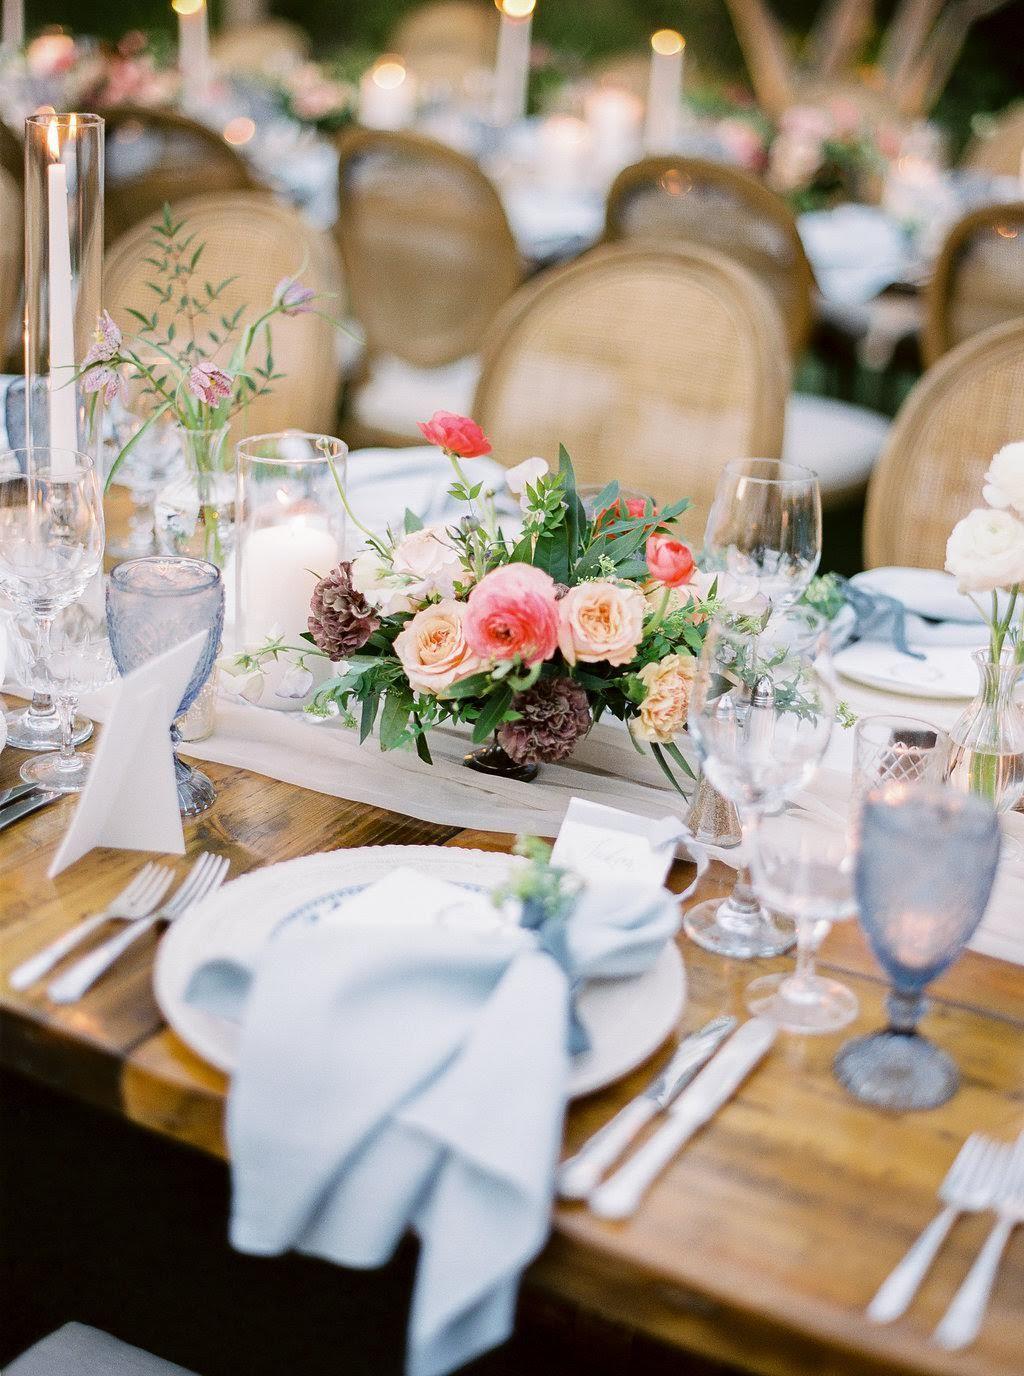 El Chorro Floral Outdoor Wedding Wedding Centerpieces Harvest Dining Table Wedding Table